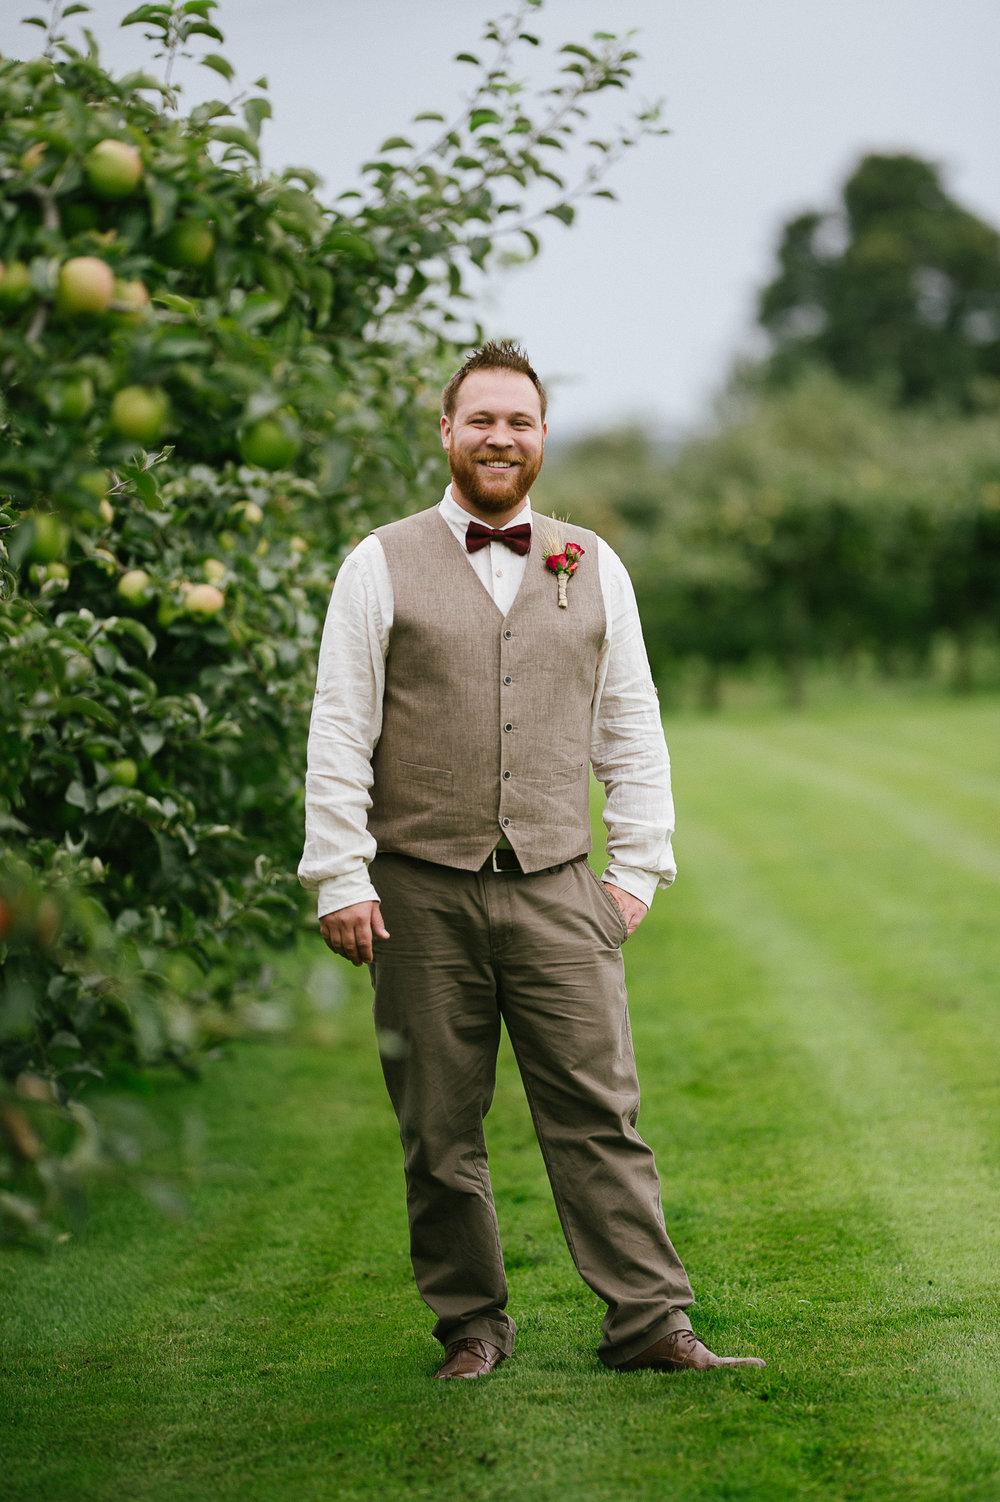 Swan Trail Farm Wedding_Sarah Schurman + Brian Skadan_Snohomish Wedding_Kelsey Lane Photography-5631.jpg